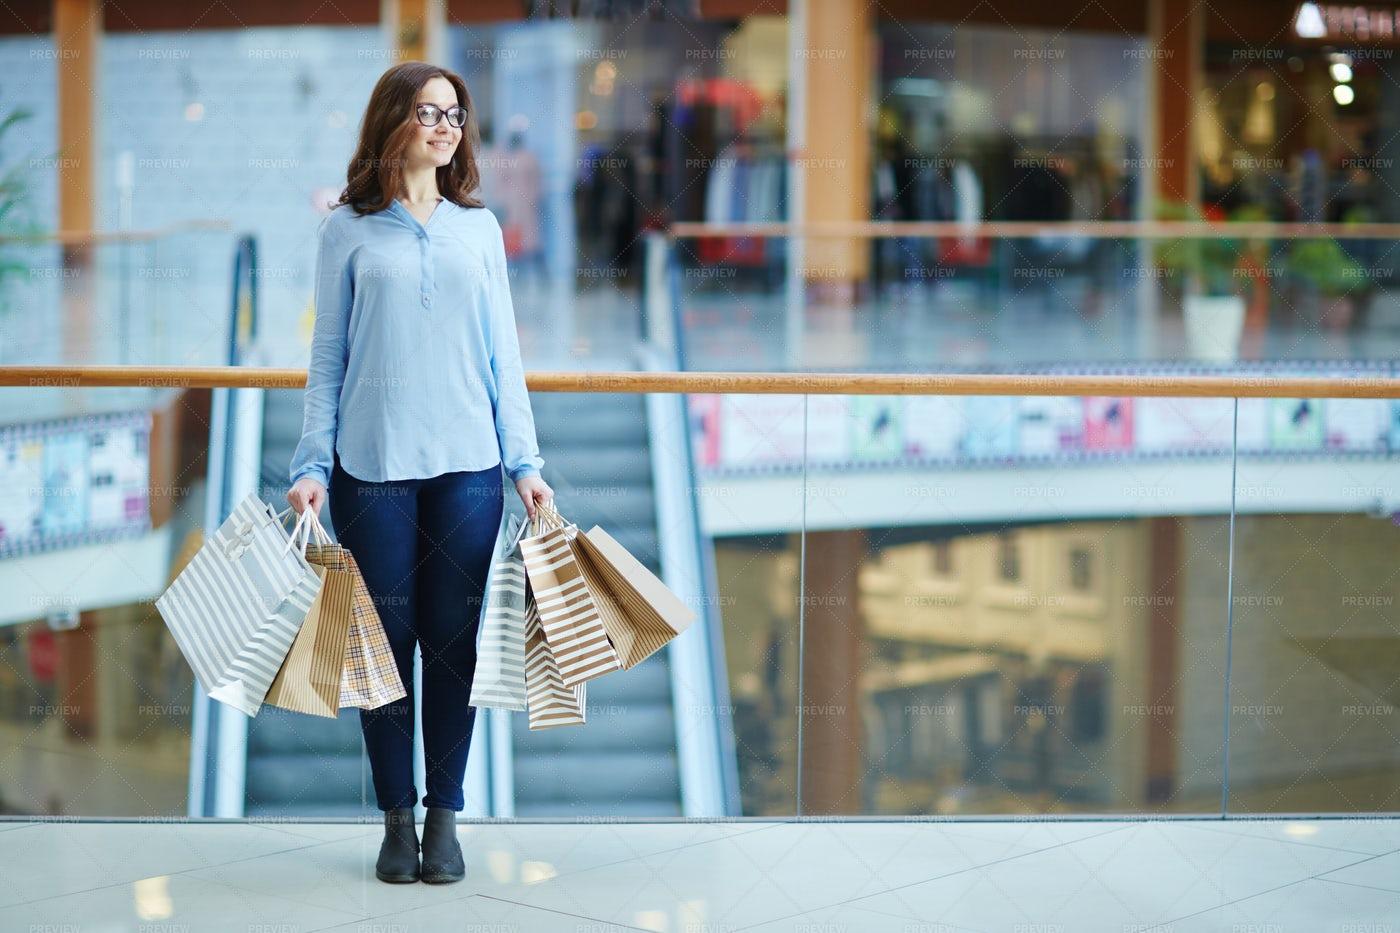 Female In Shopping Center: Stock Photos